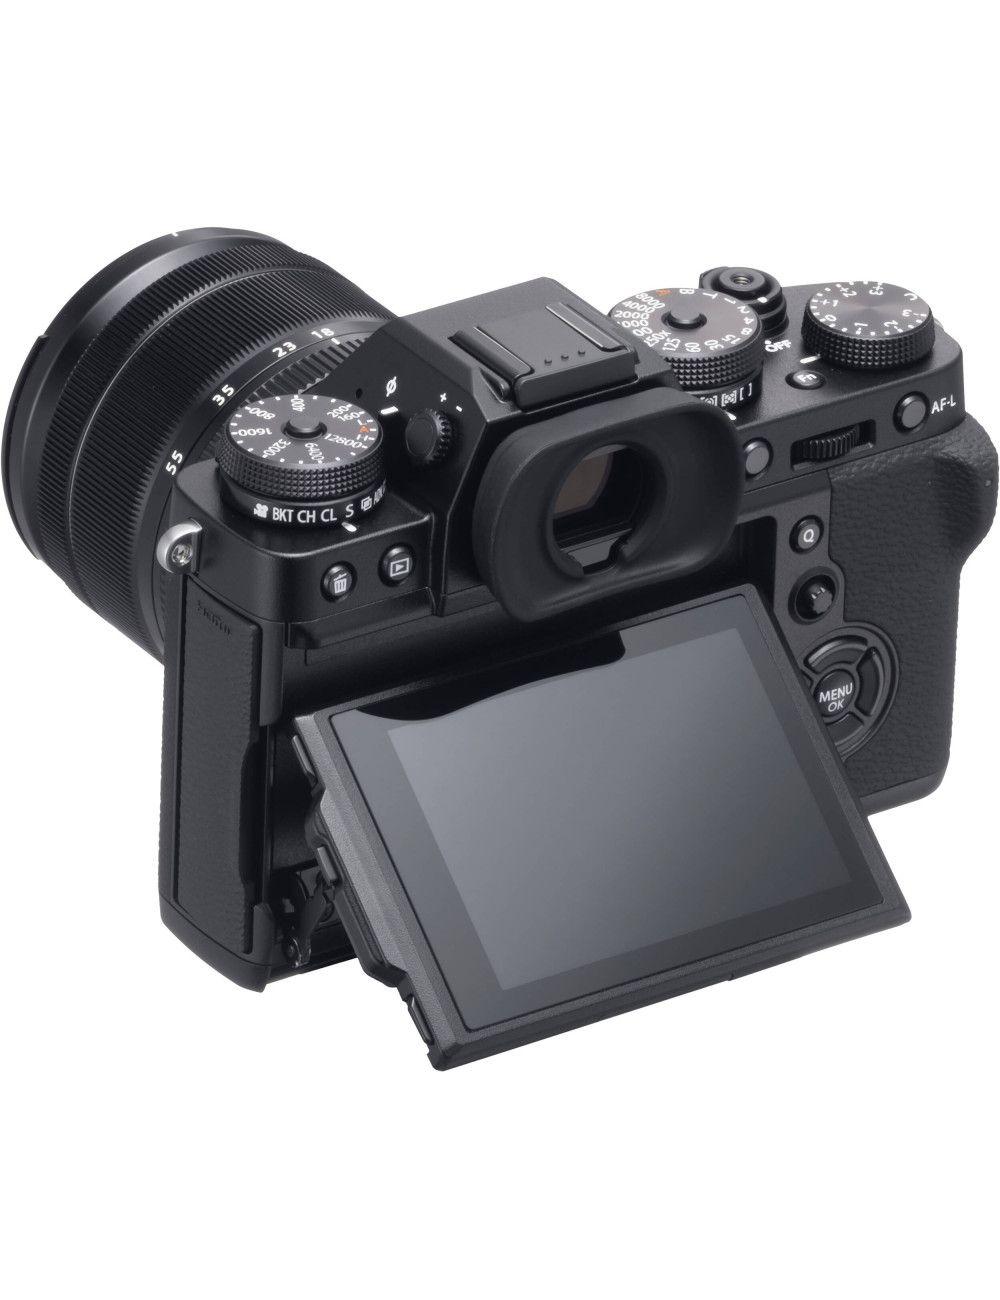 Yongnuo YN 35mm f/1.4 Lente Para Canon EF Gran Angular en Chile www.apertura.cl